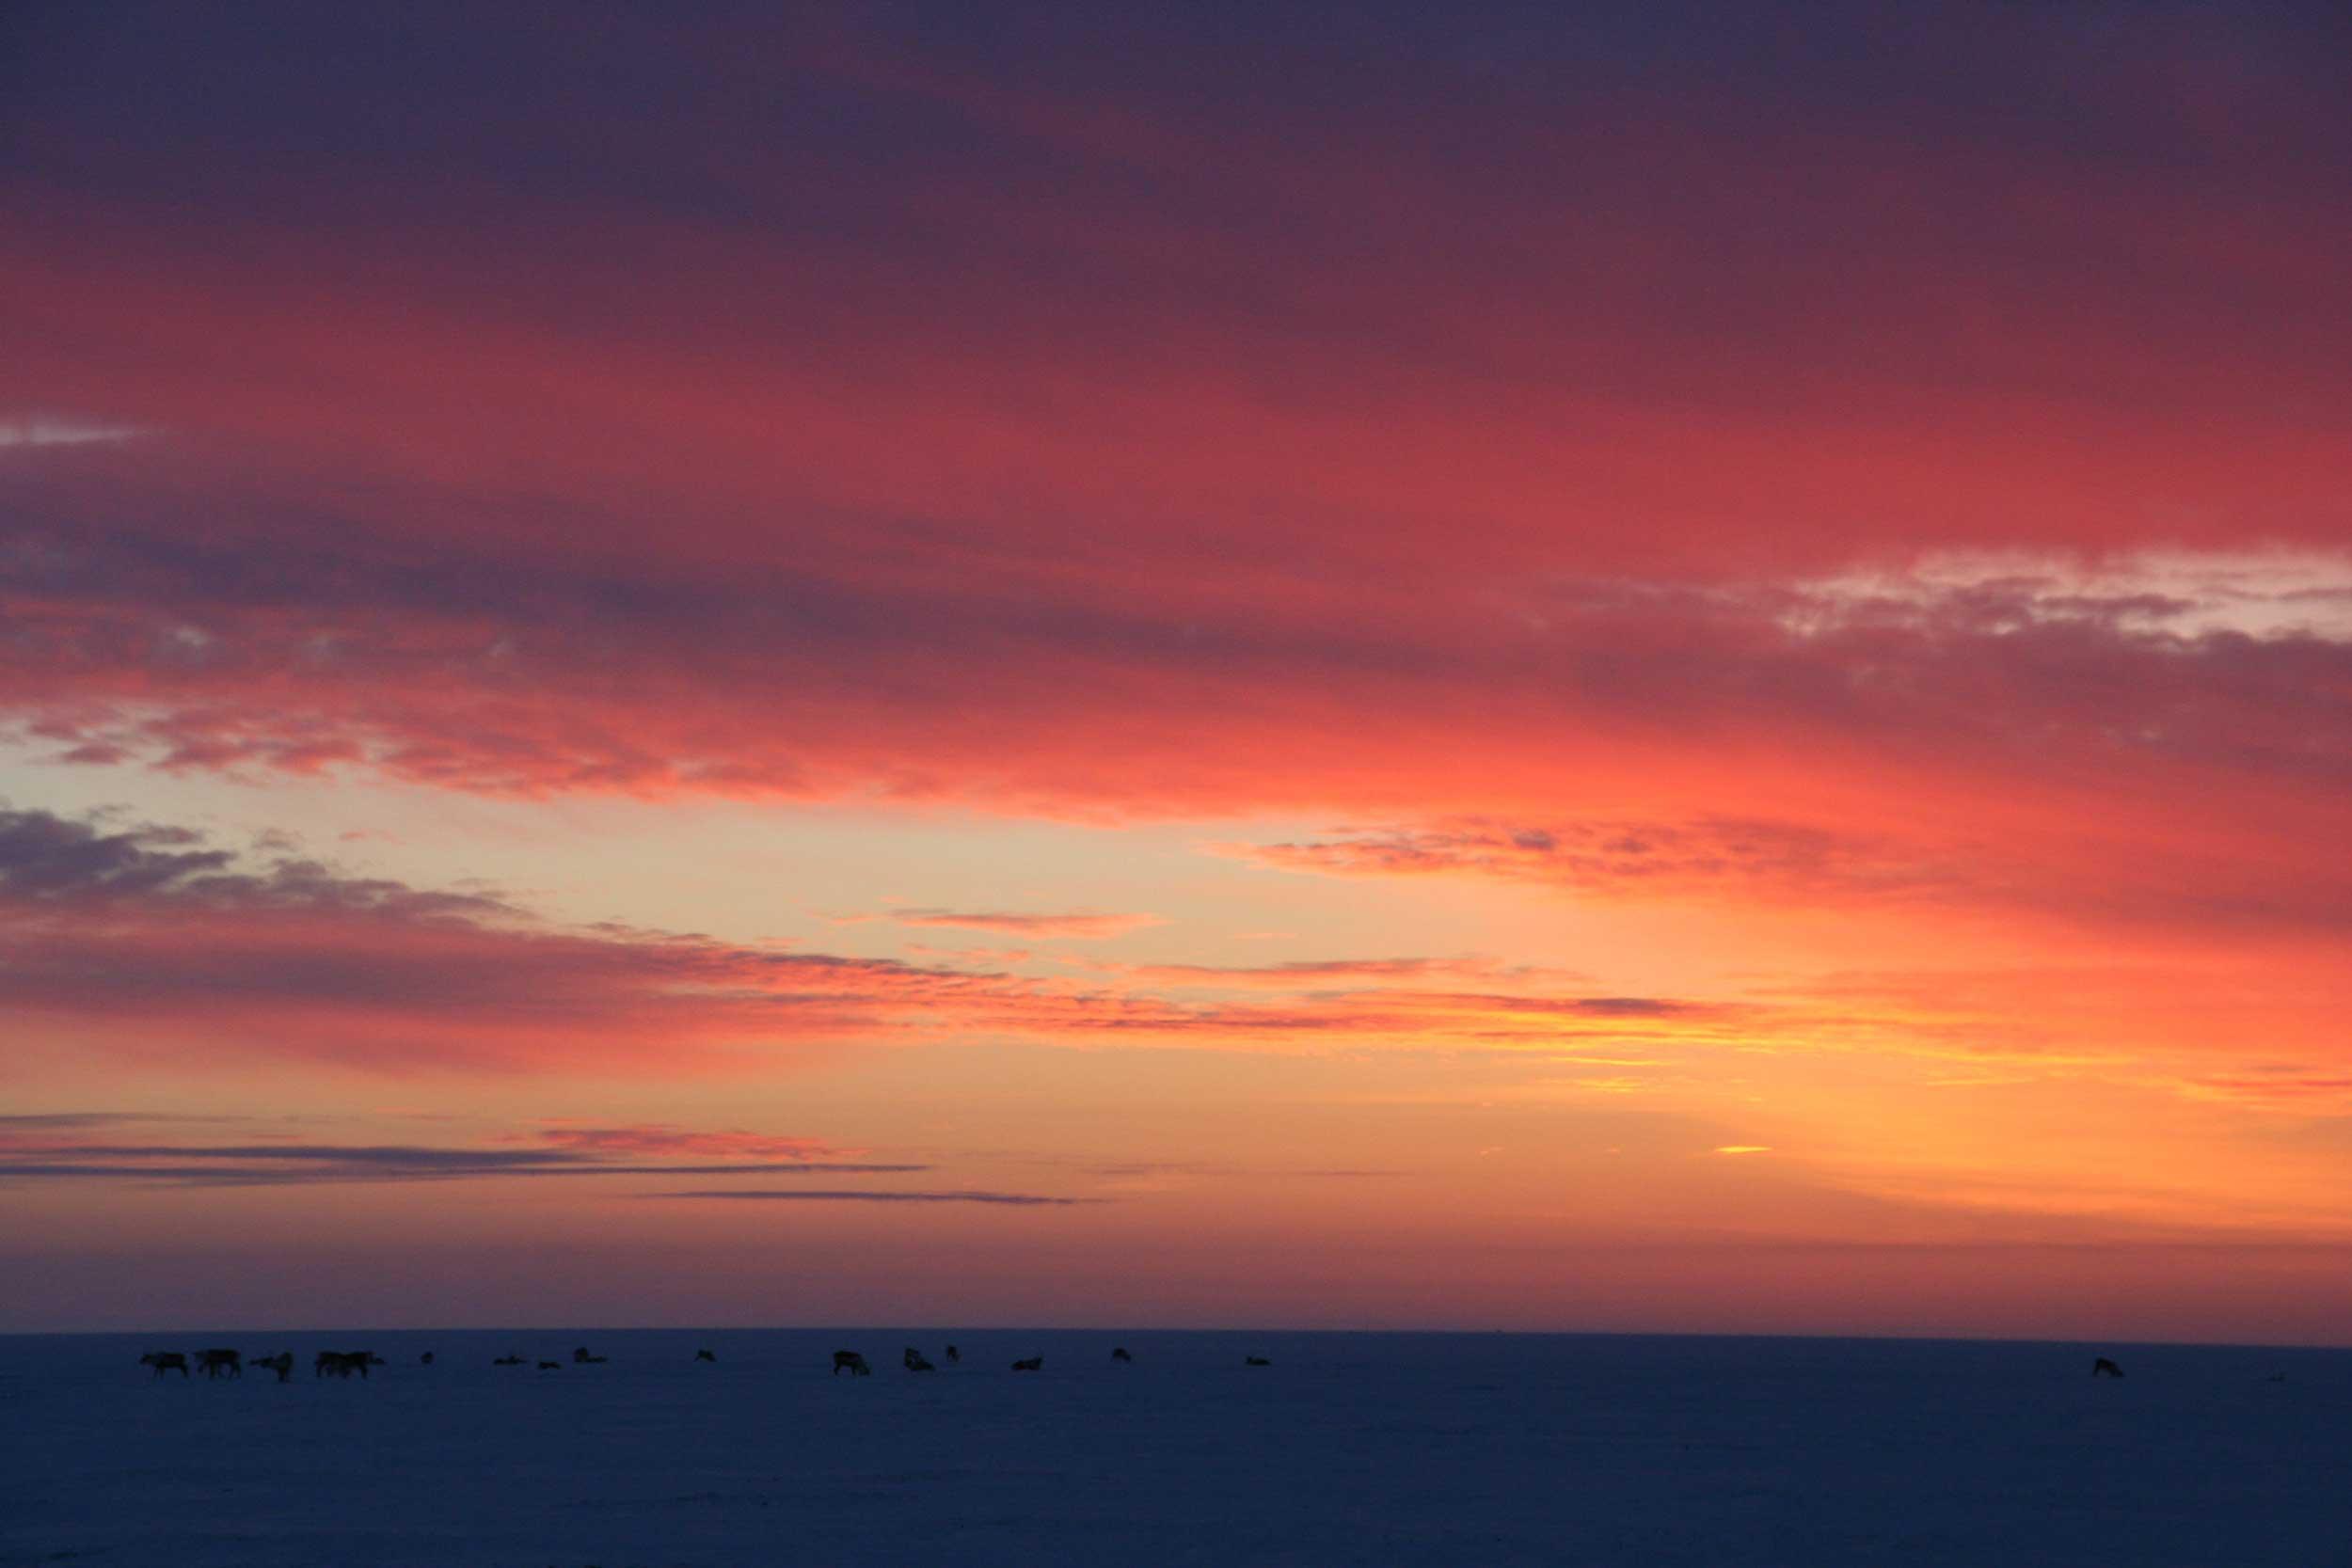 The sun rises over caribou on the Alaskan coastal tundra. Image credit: Kerri Pratt